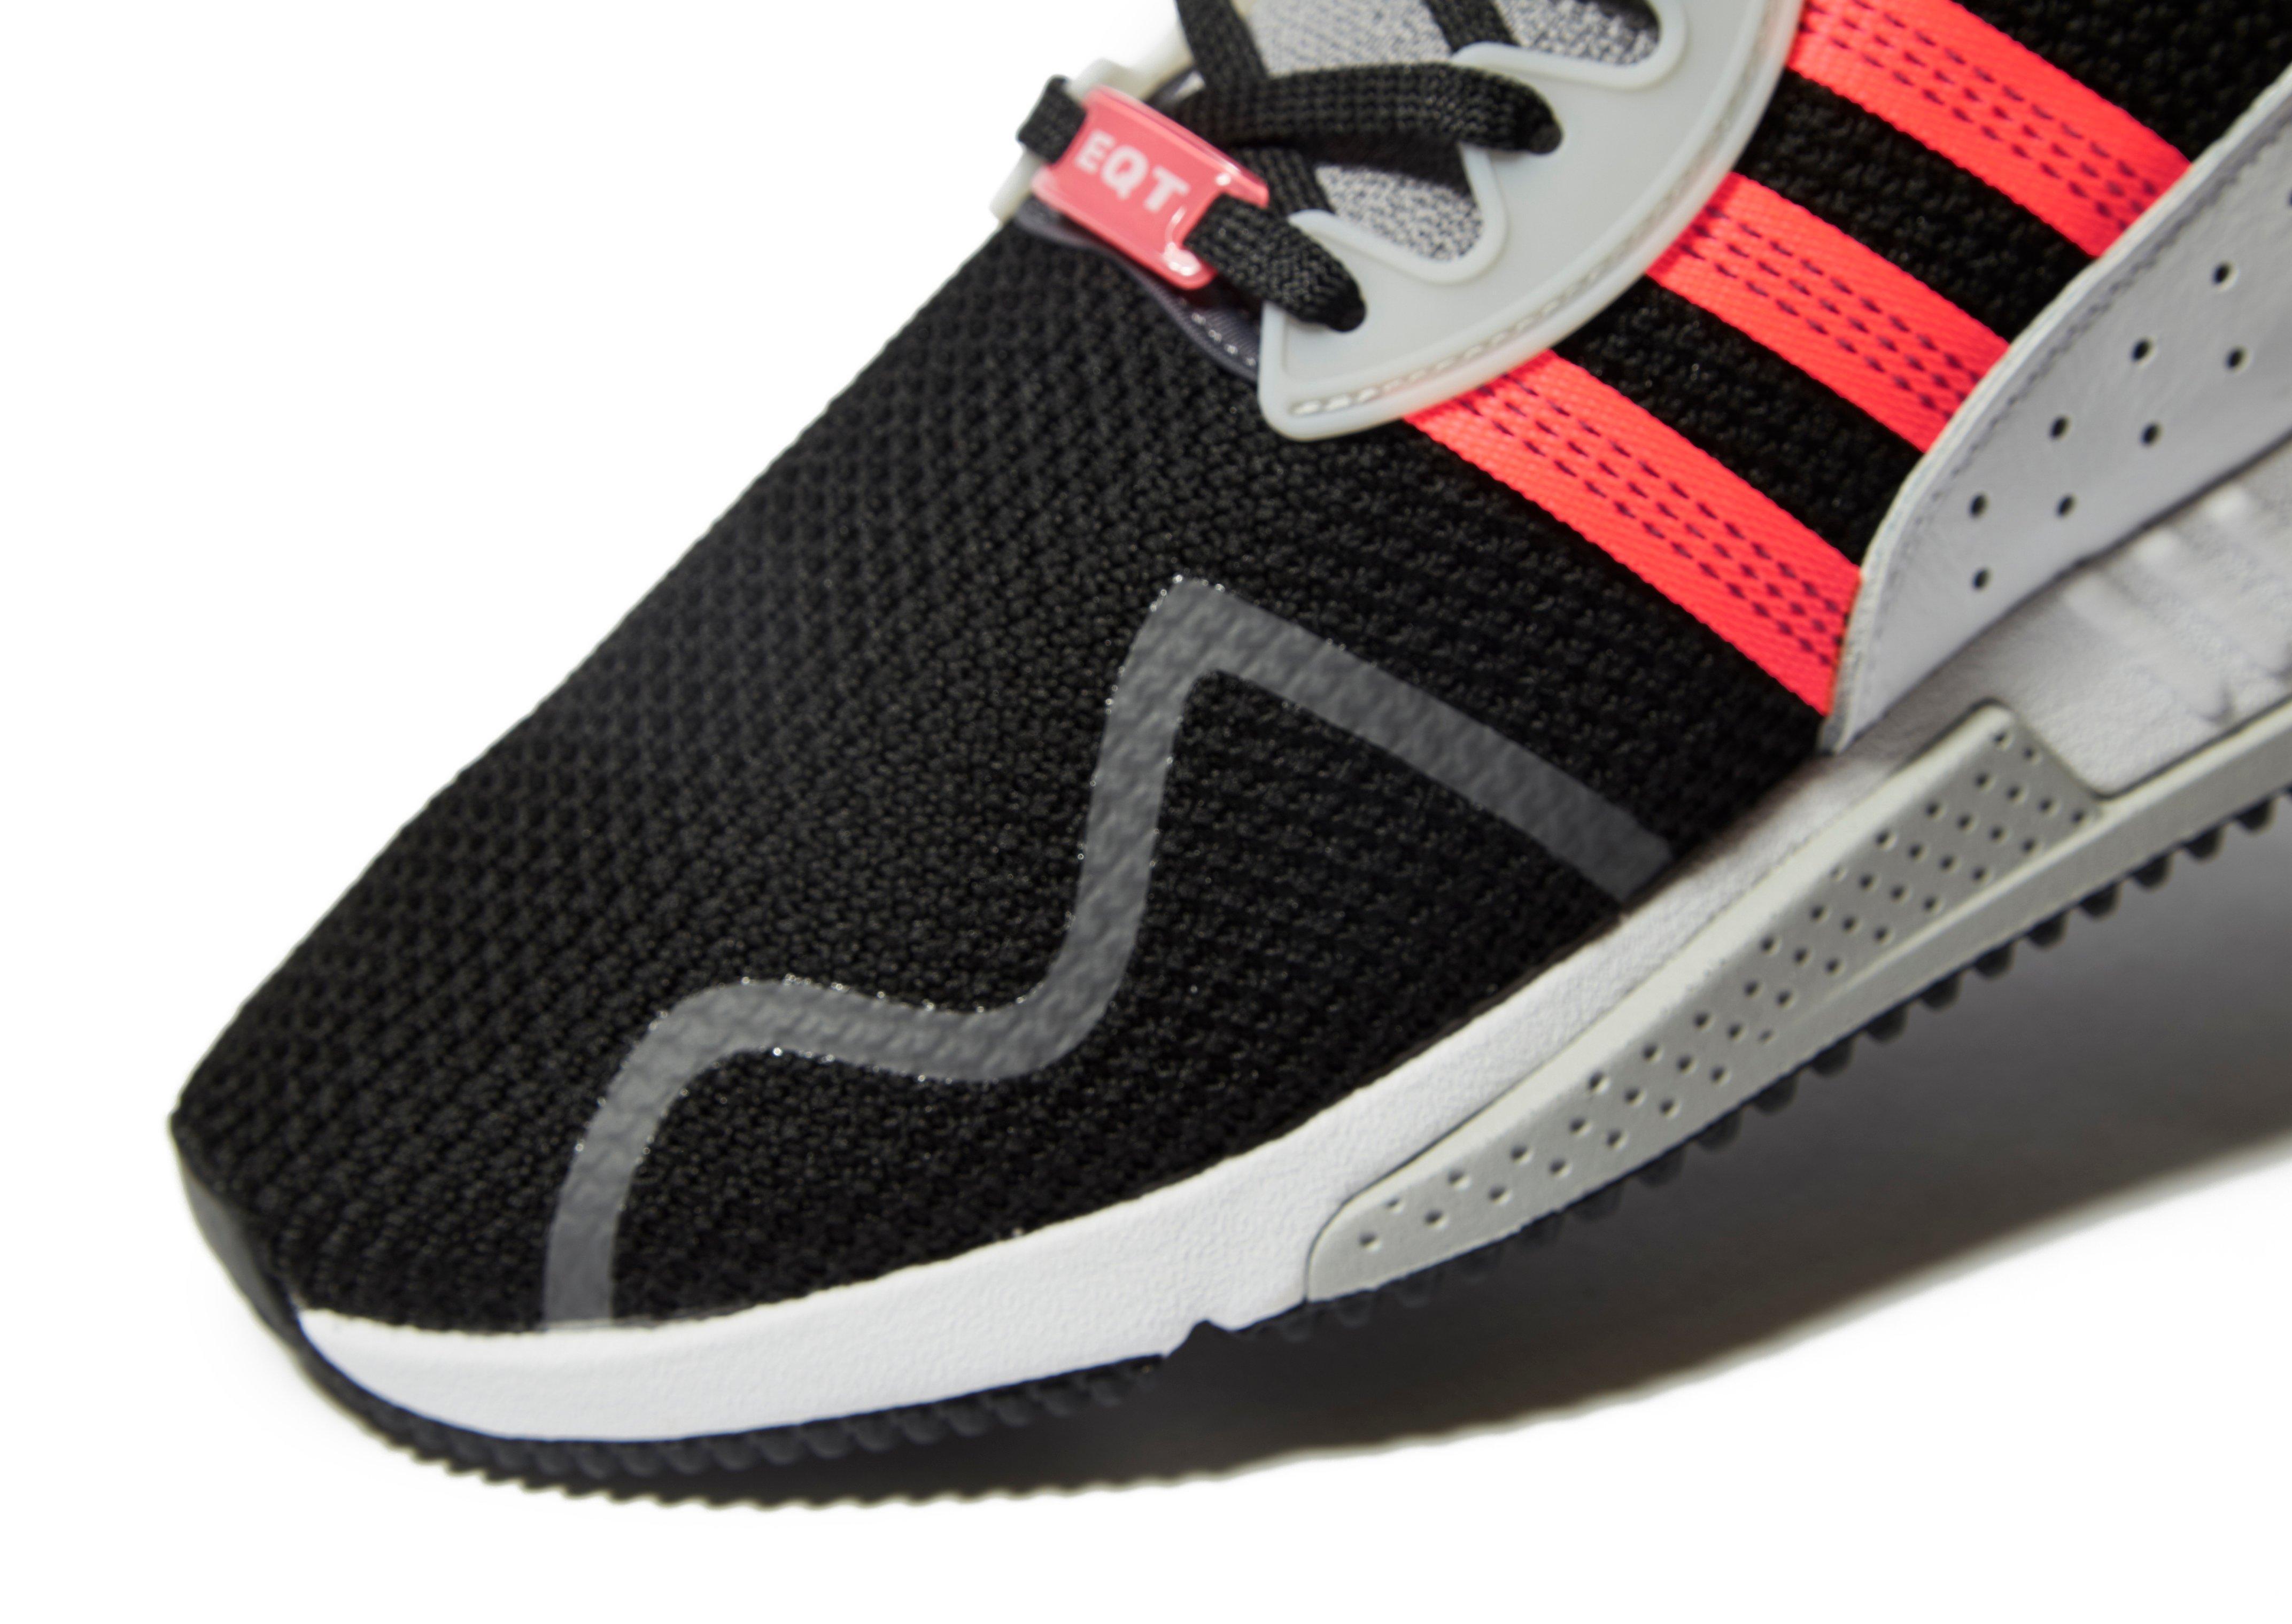 adidas Originals Lace Eqt Cushion Adv in Black/White/Orange (Black) for Men